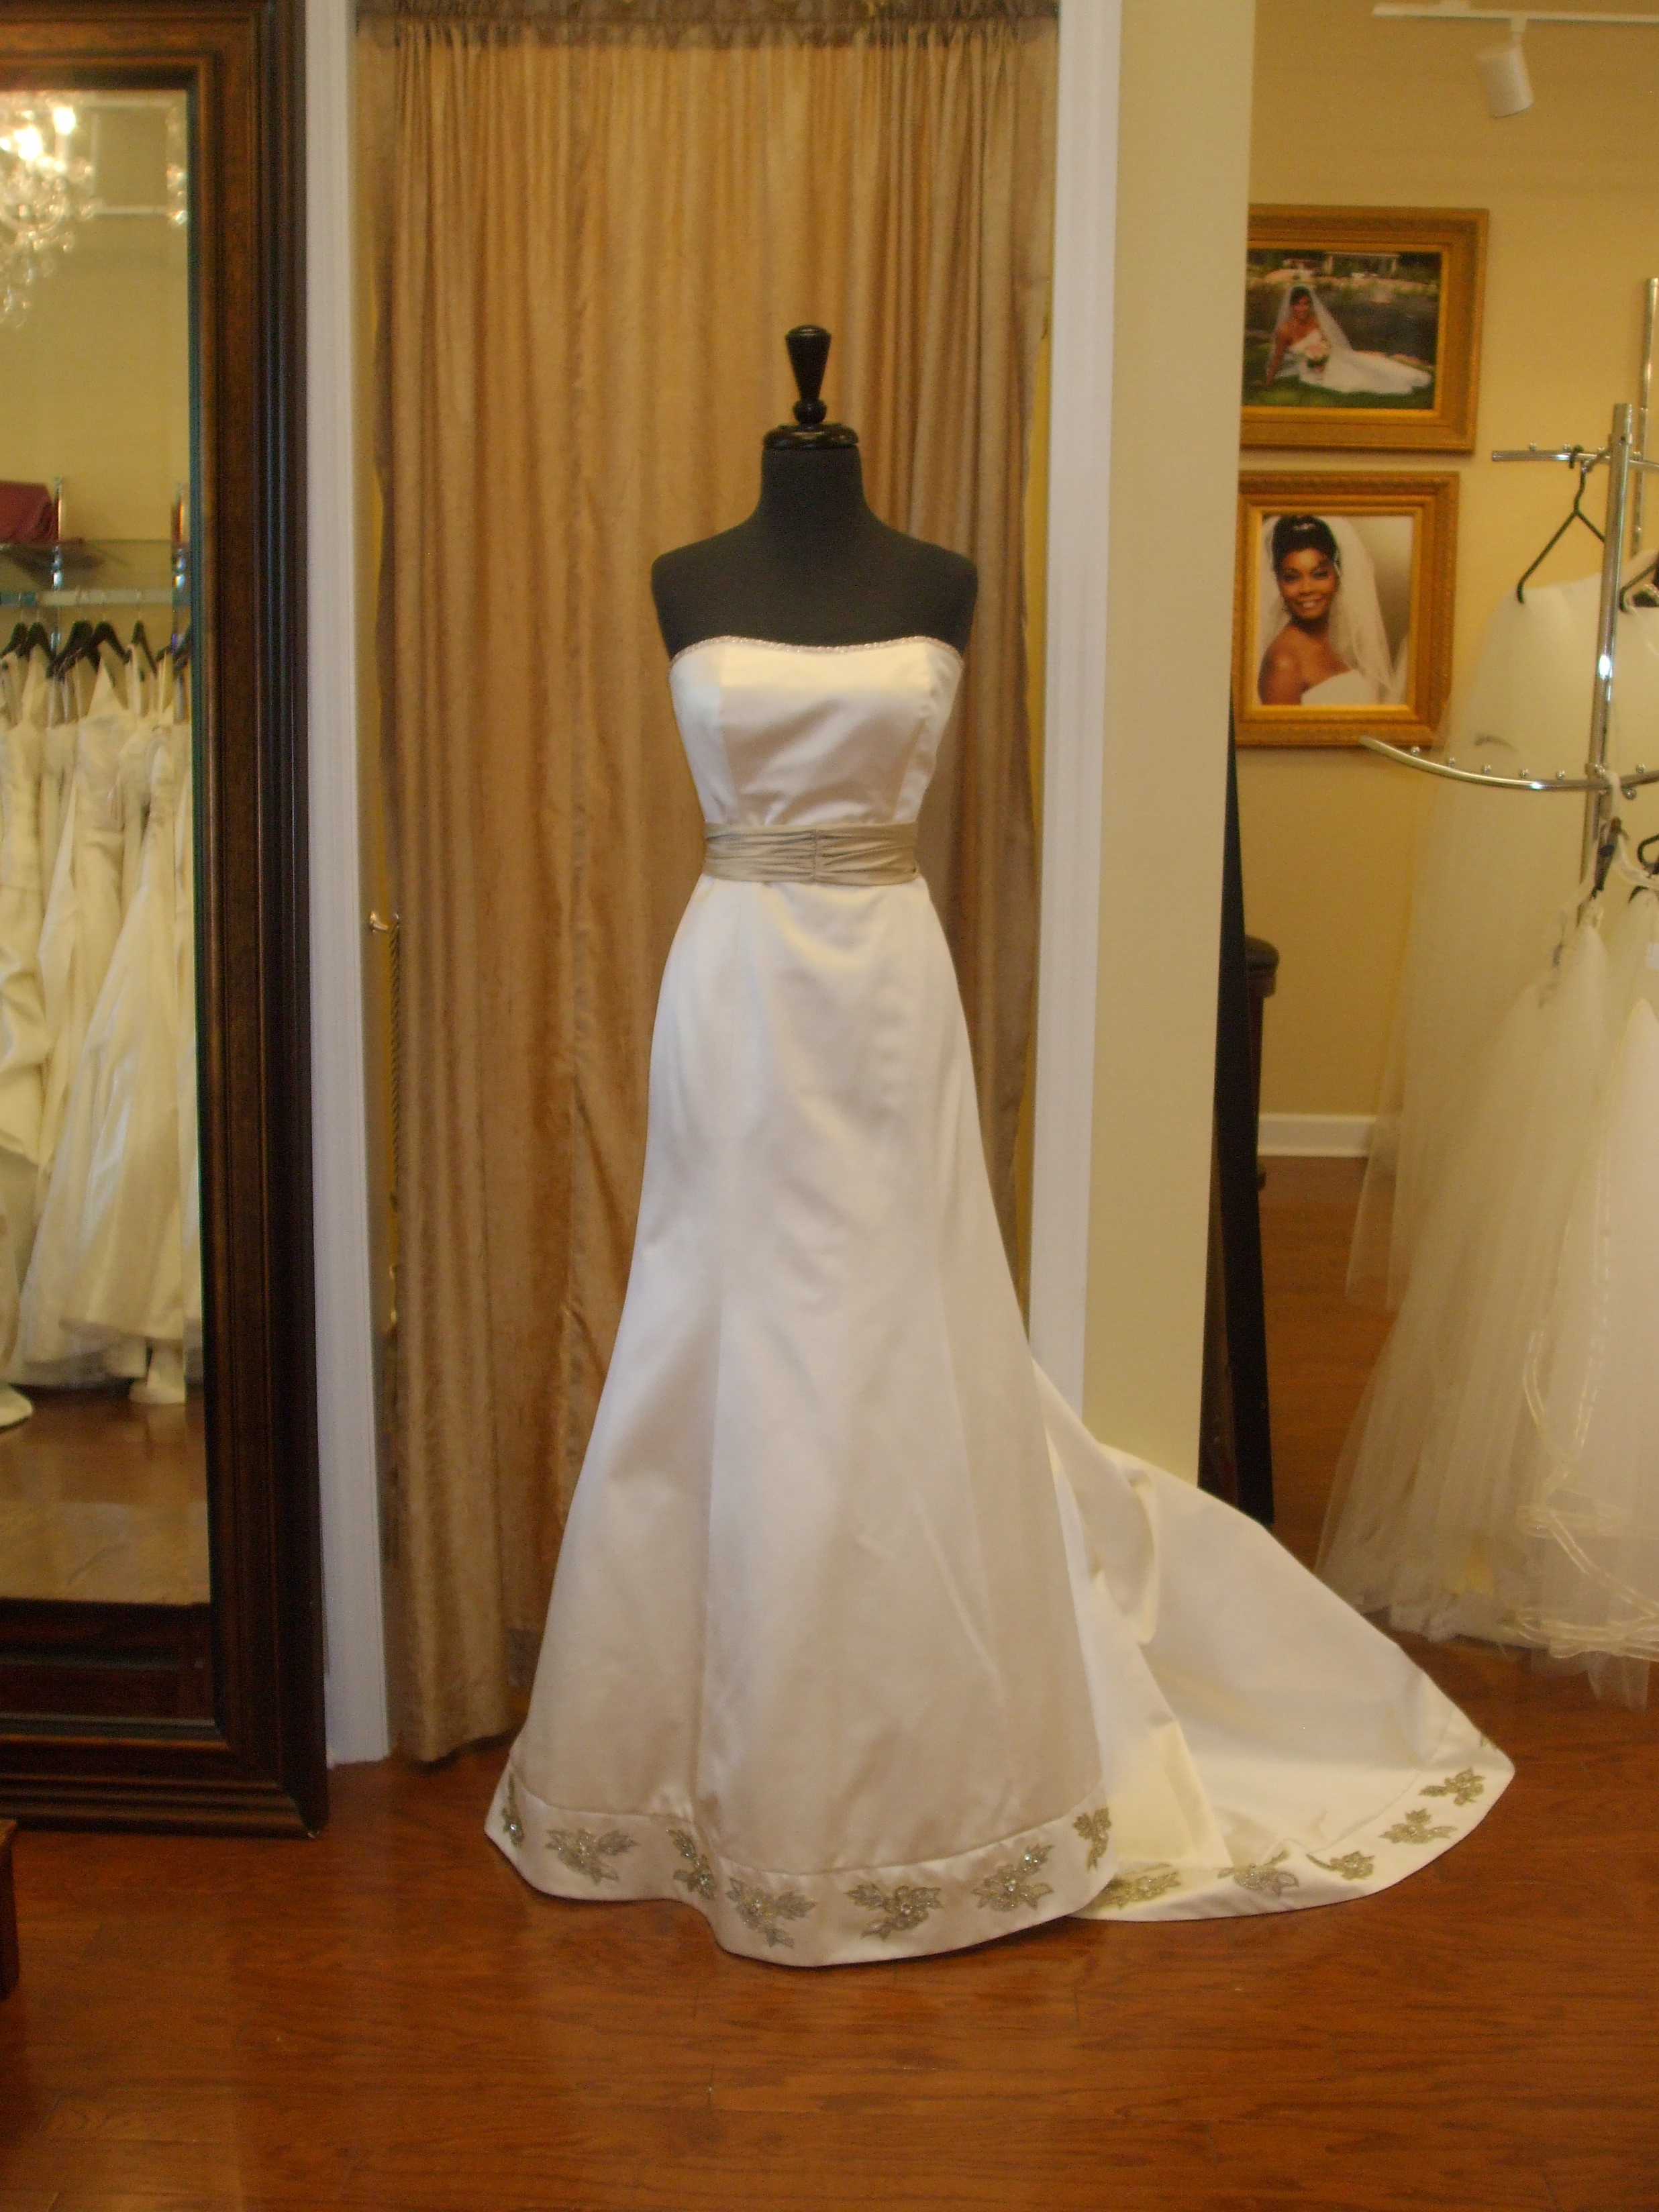 Atlanta bridal boutique etain bridal boutique 39 s weblog for Wedding dress boutiques in atlanta